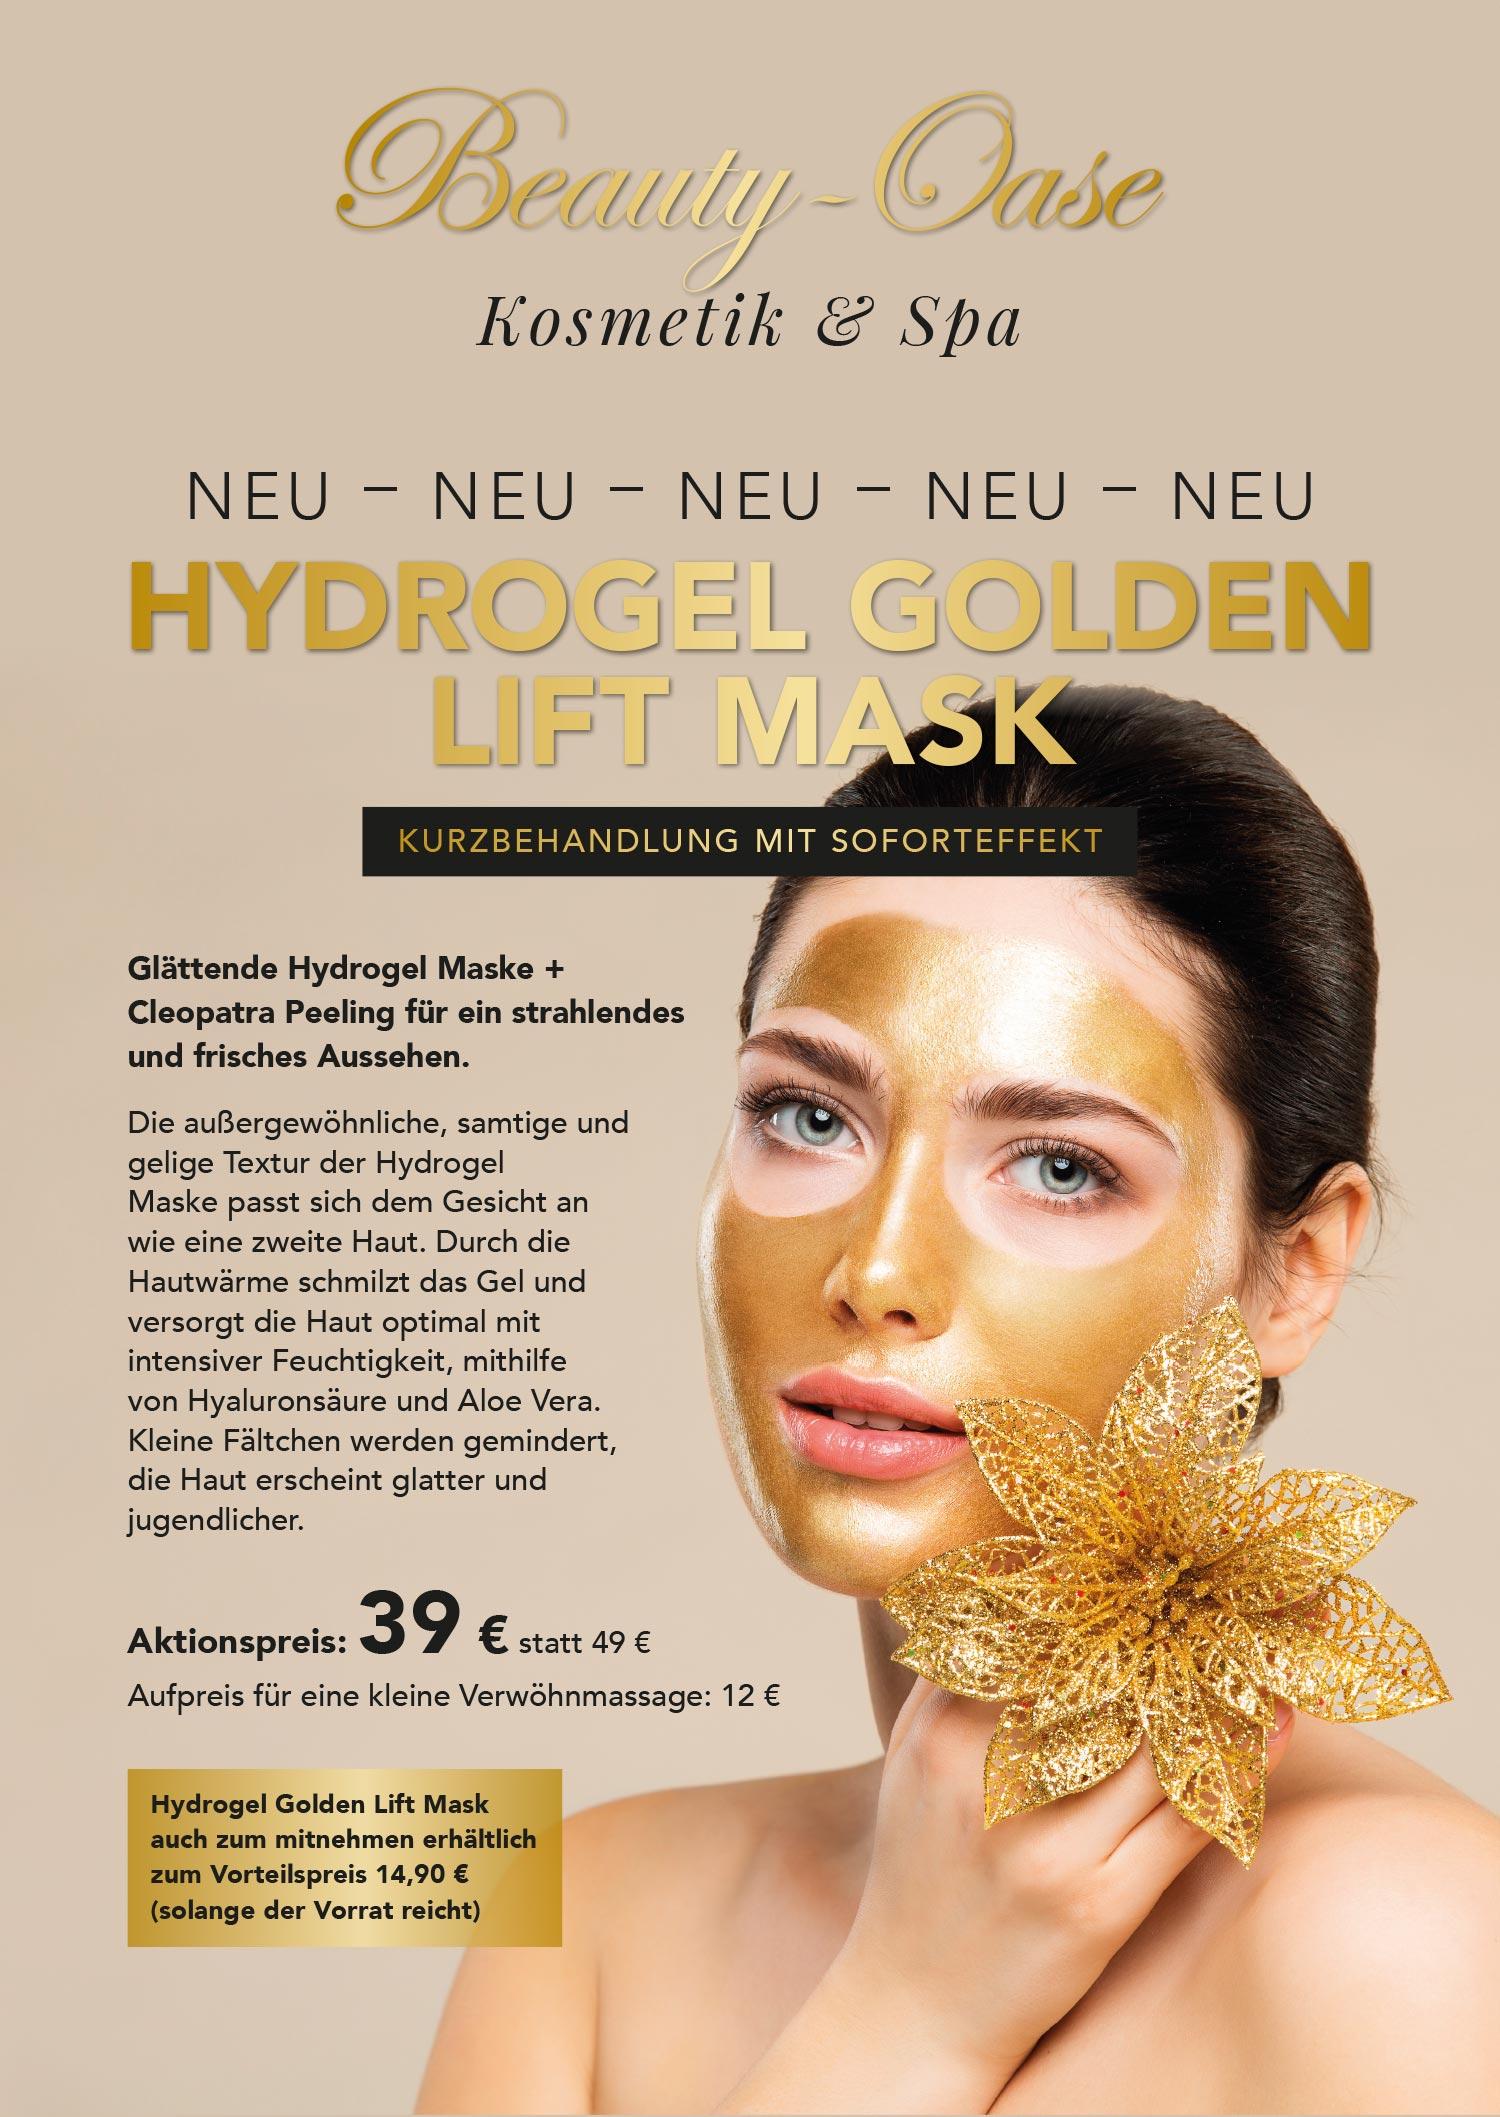 plakat-hydrogel-golden-lift-mask